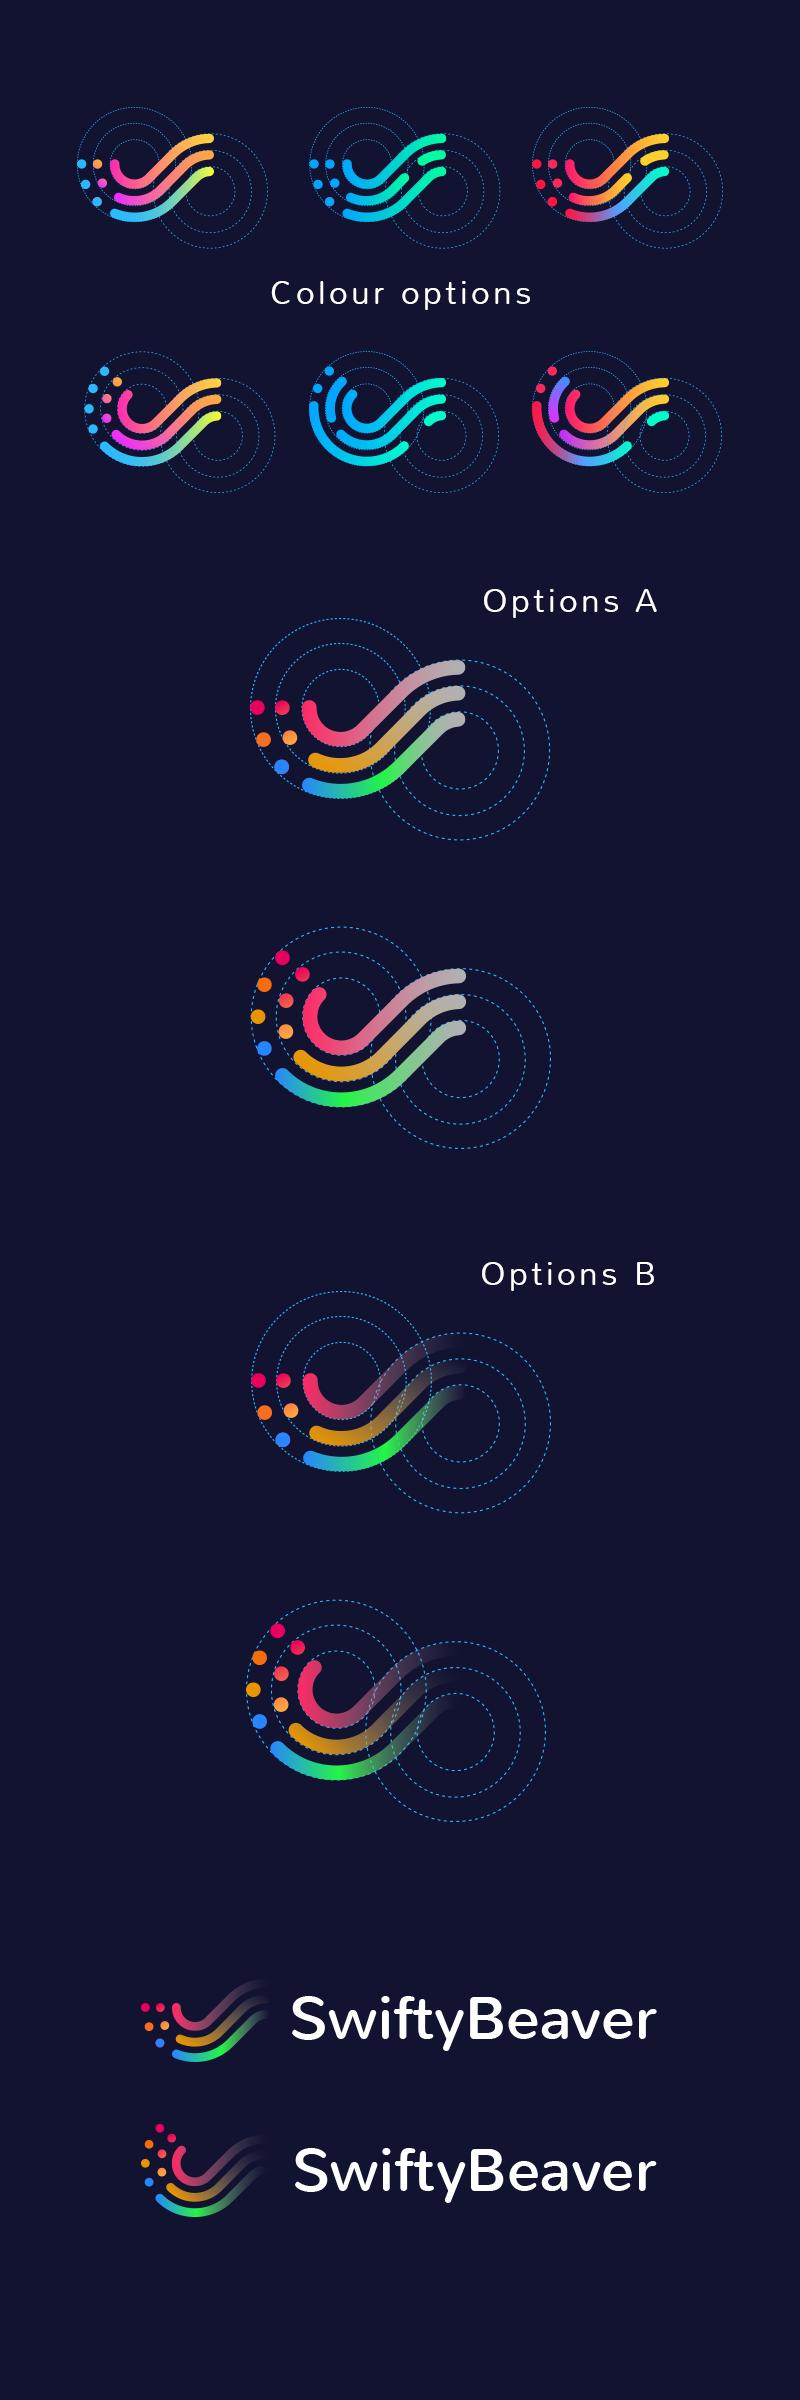 swiftybeaver logo design by tubik studio